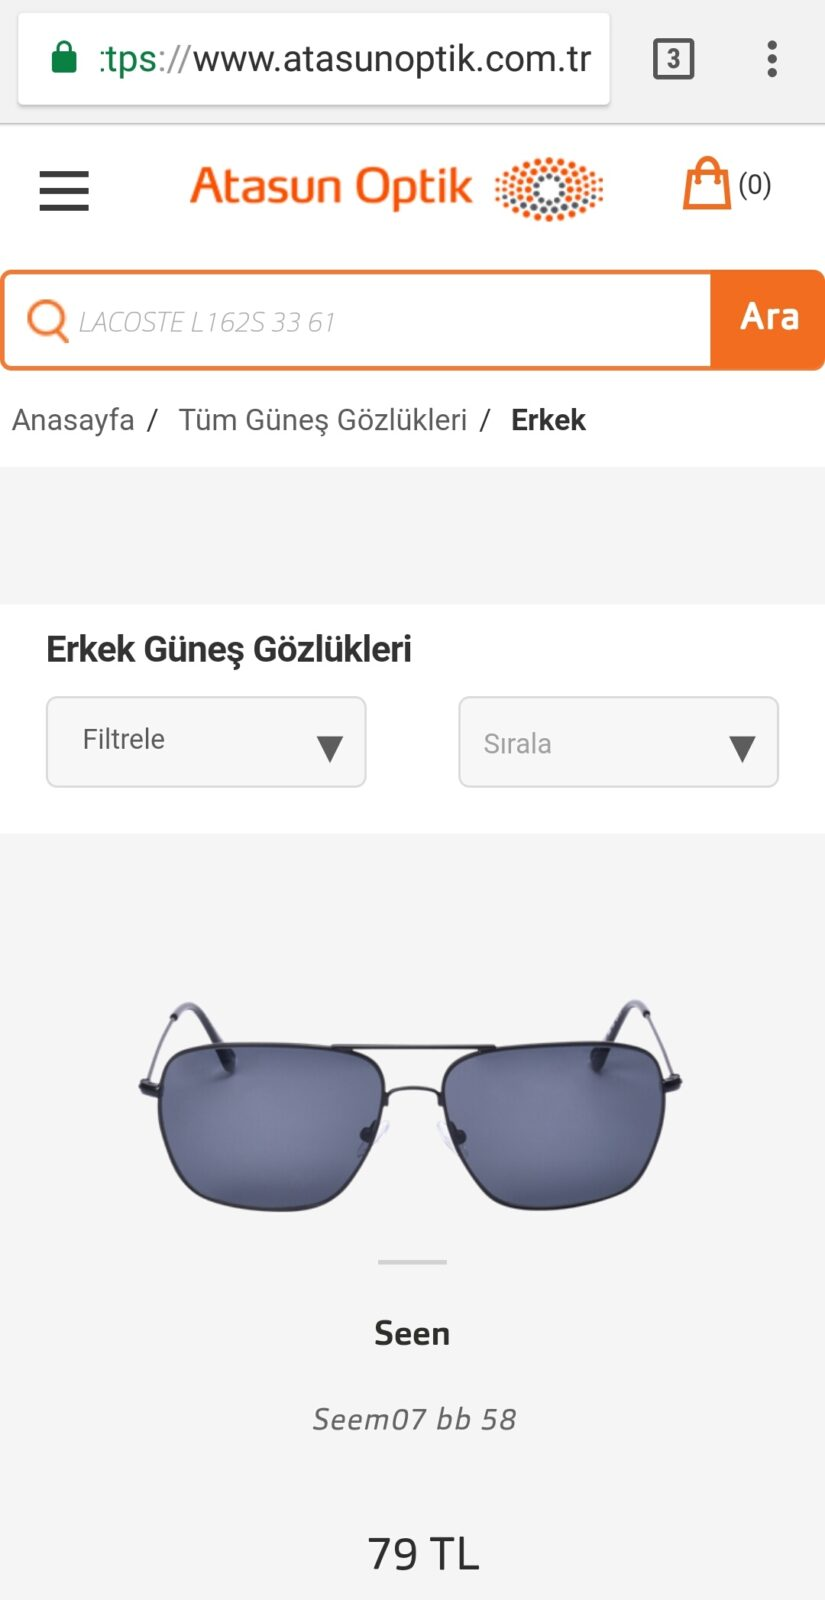 Atasun_optik_web_site